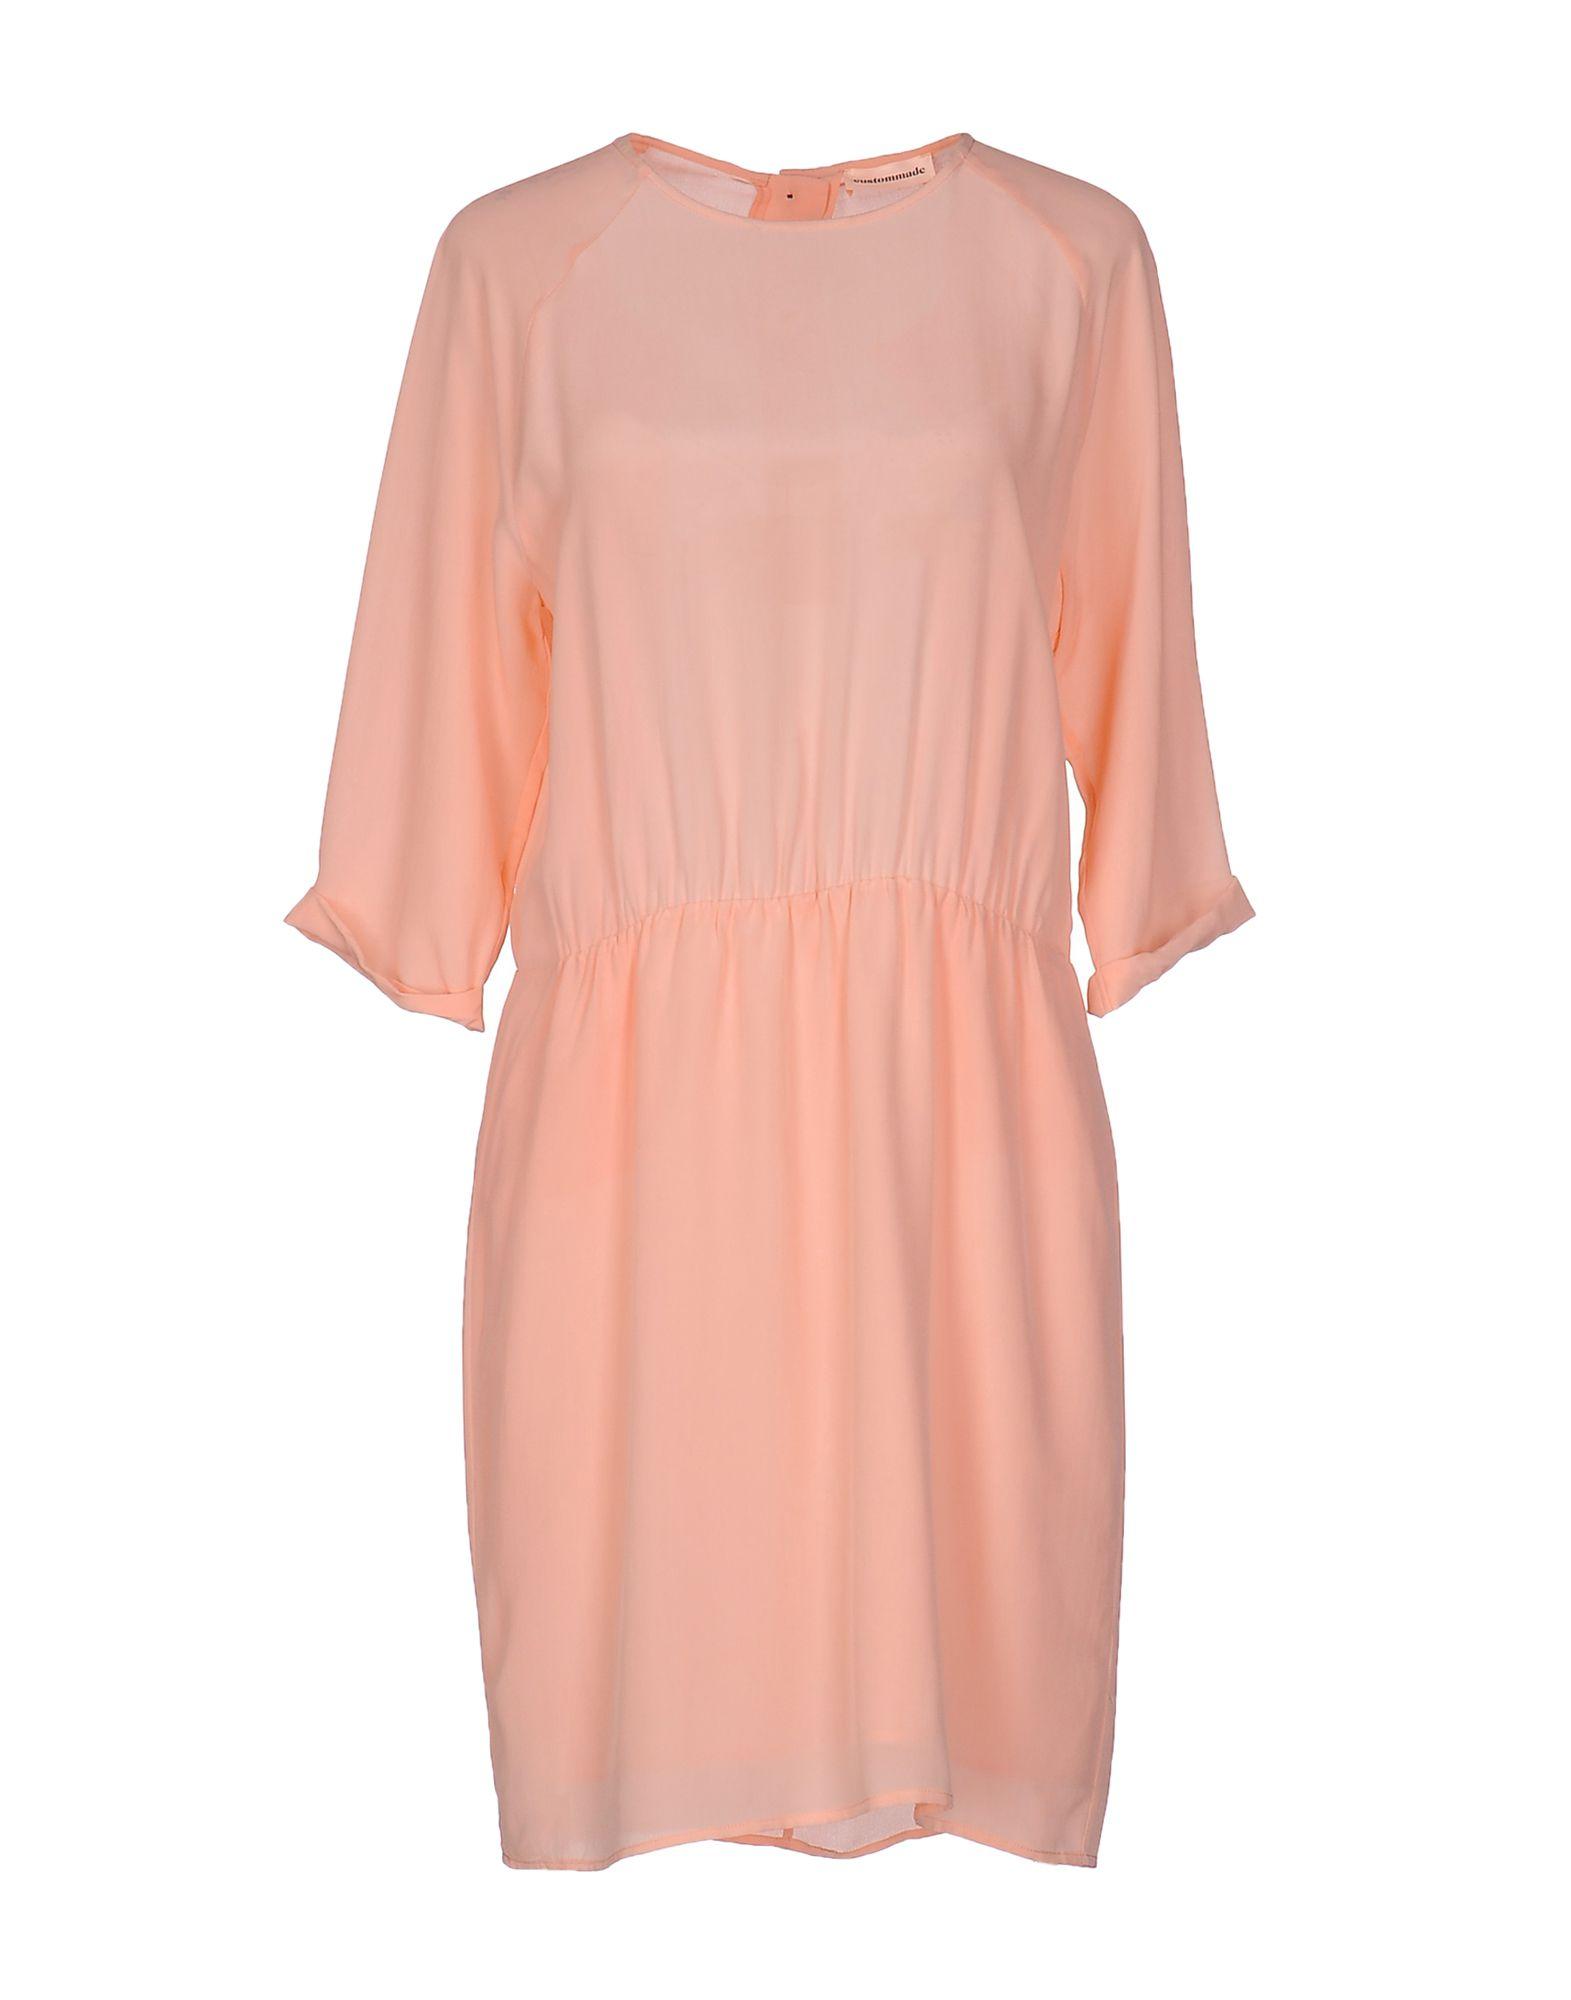 CUSTOMMADE Short Dresses in Light Pink